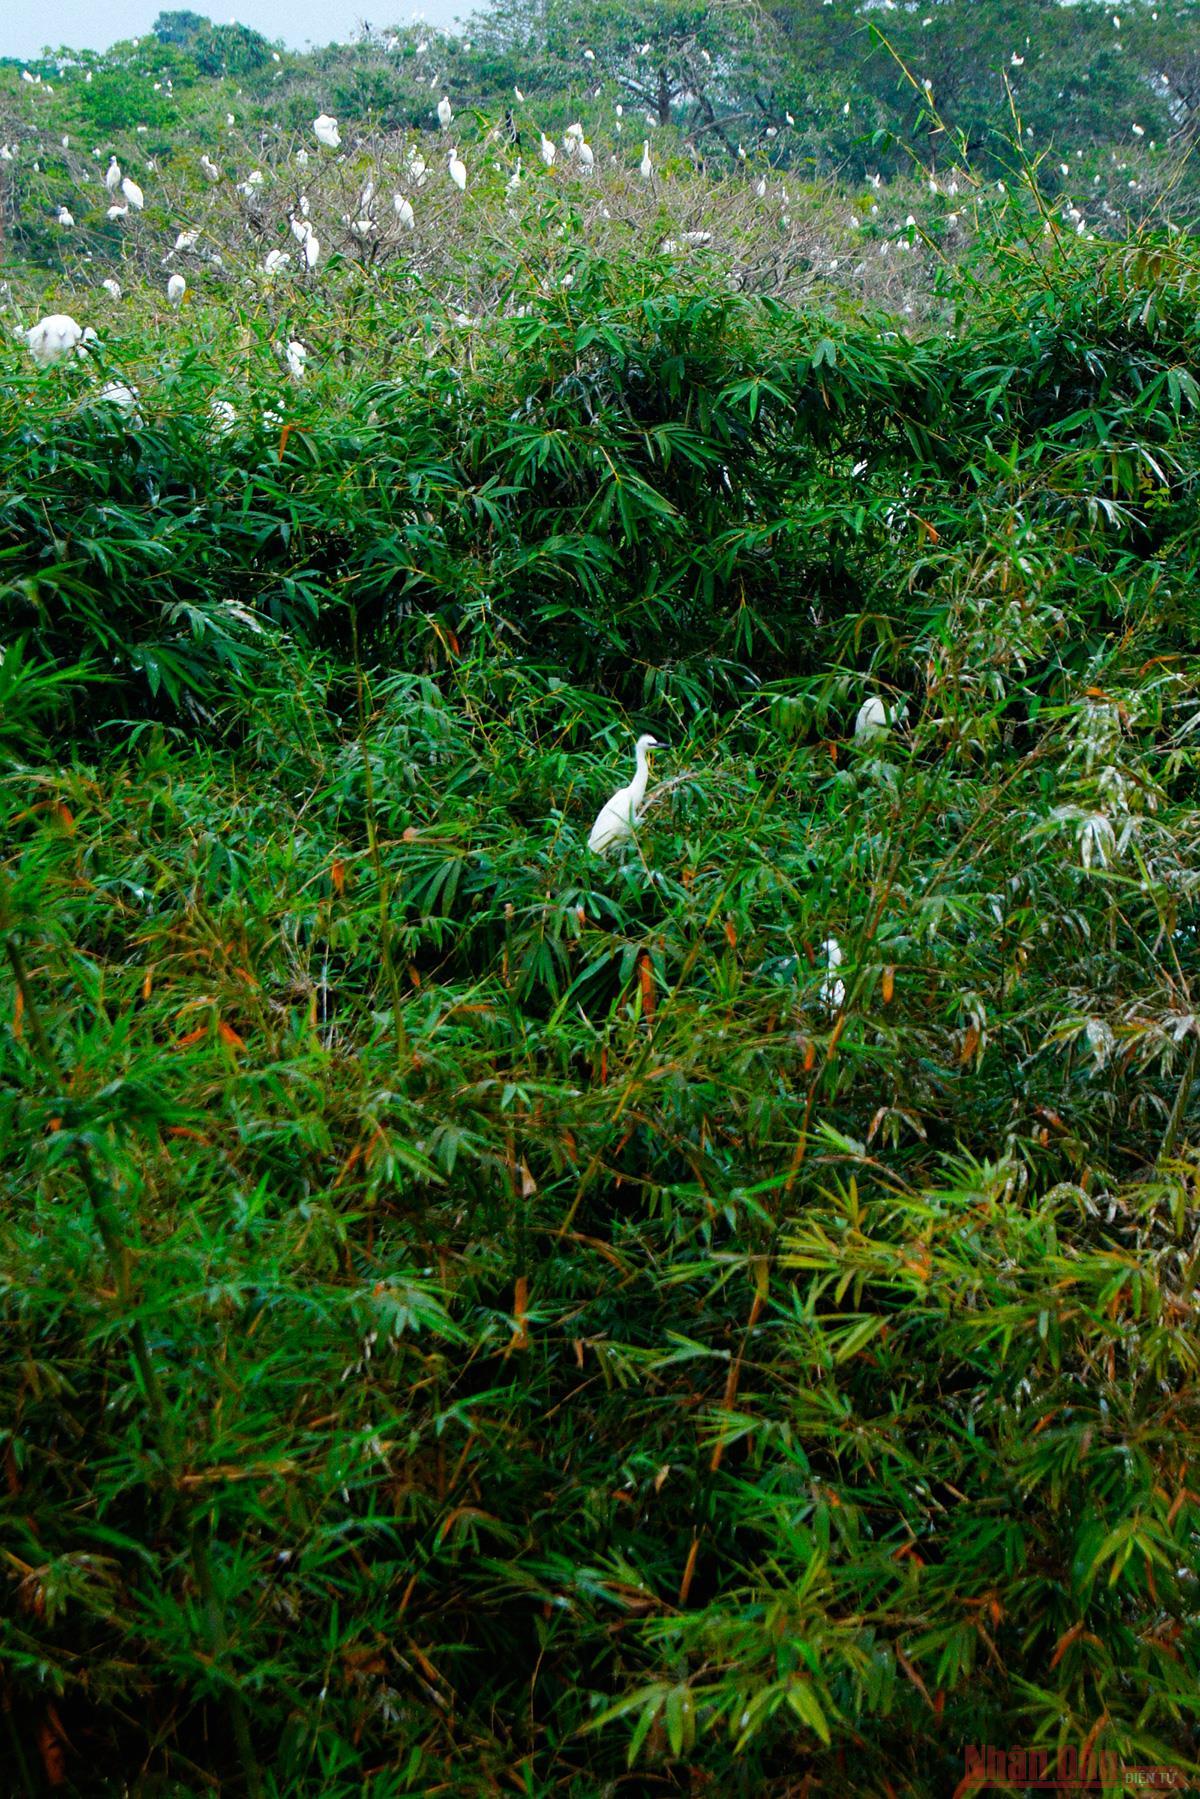 Bang Lang Stork Garden, the largest bird sanctuary in Vietnam's Mekong Delta